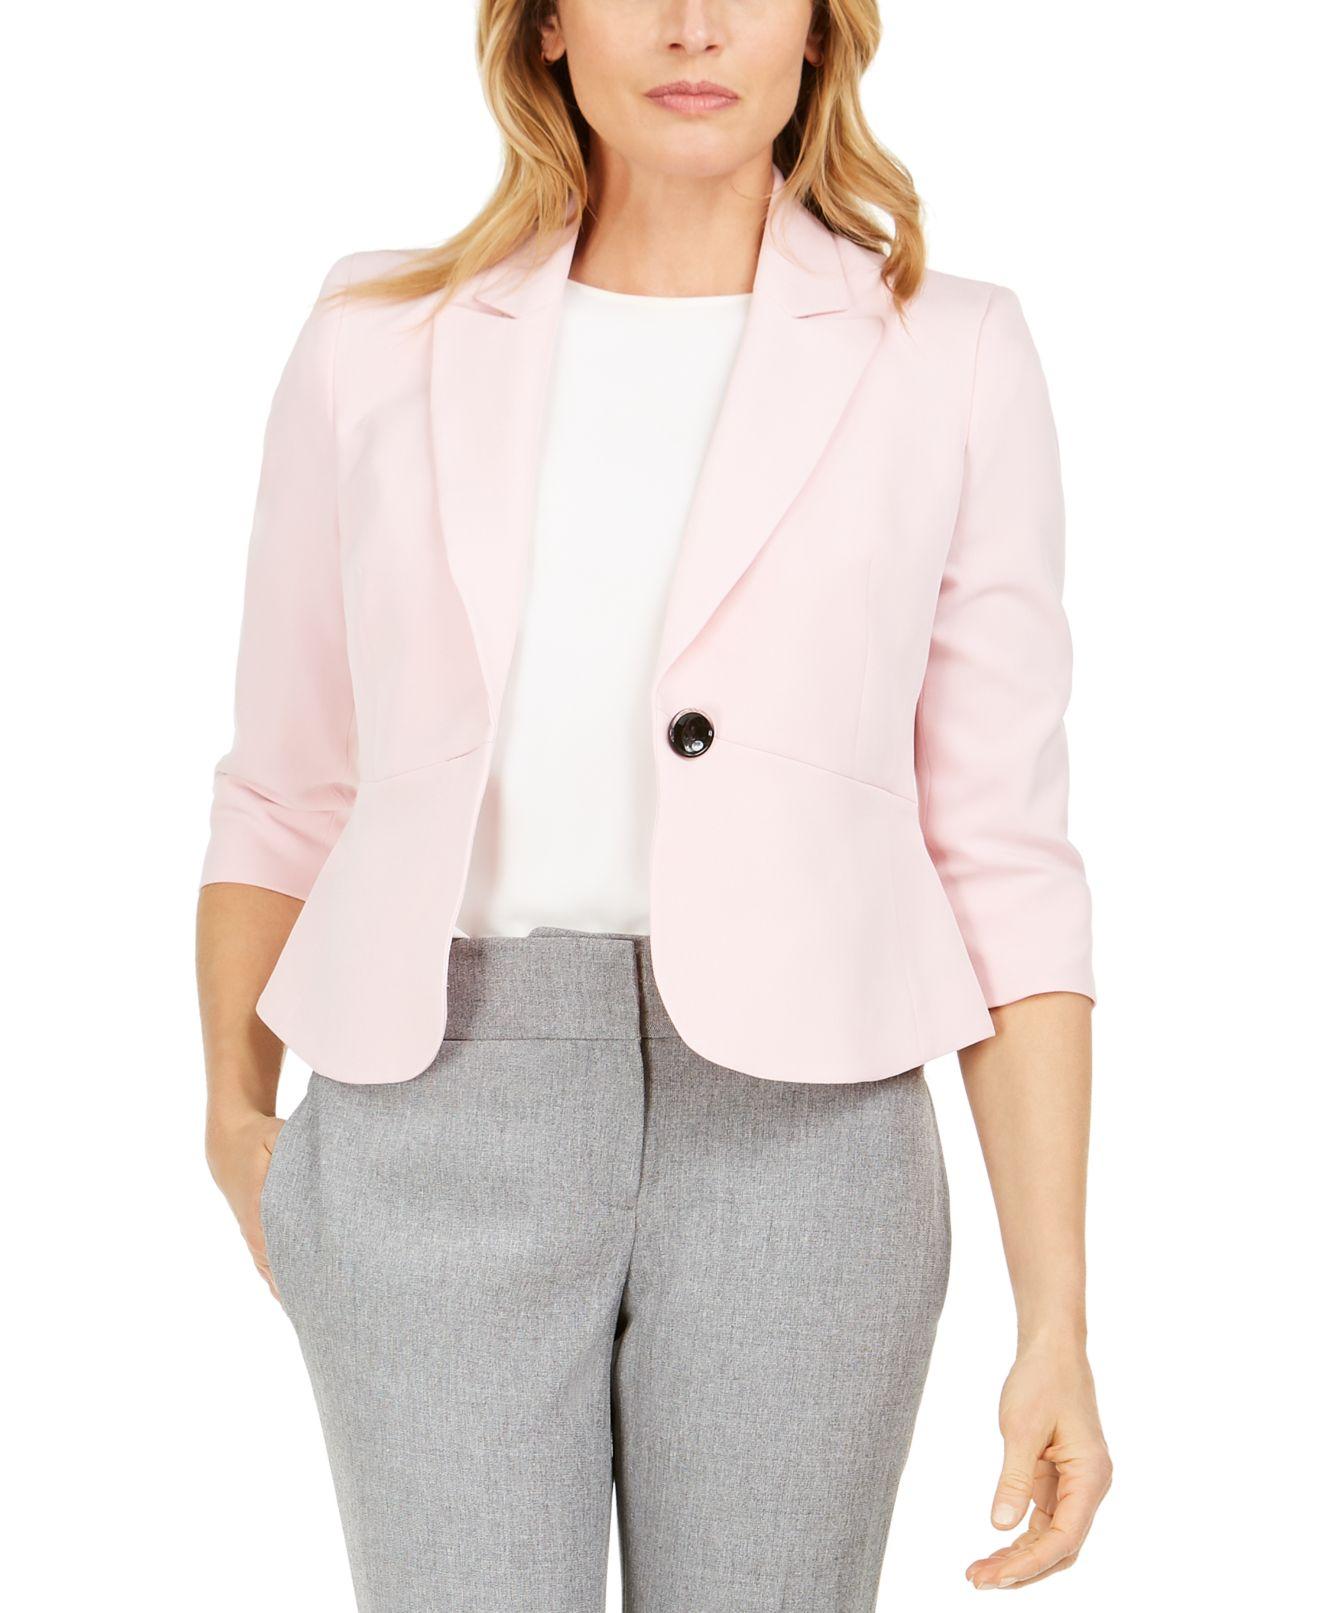 Kasper Womens Jacket Pink Size 6P Petite Stretch One-Button 3/4 Sleeve